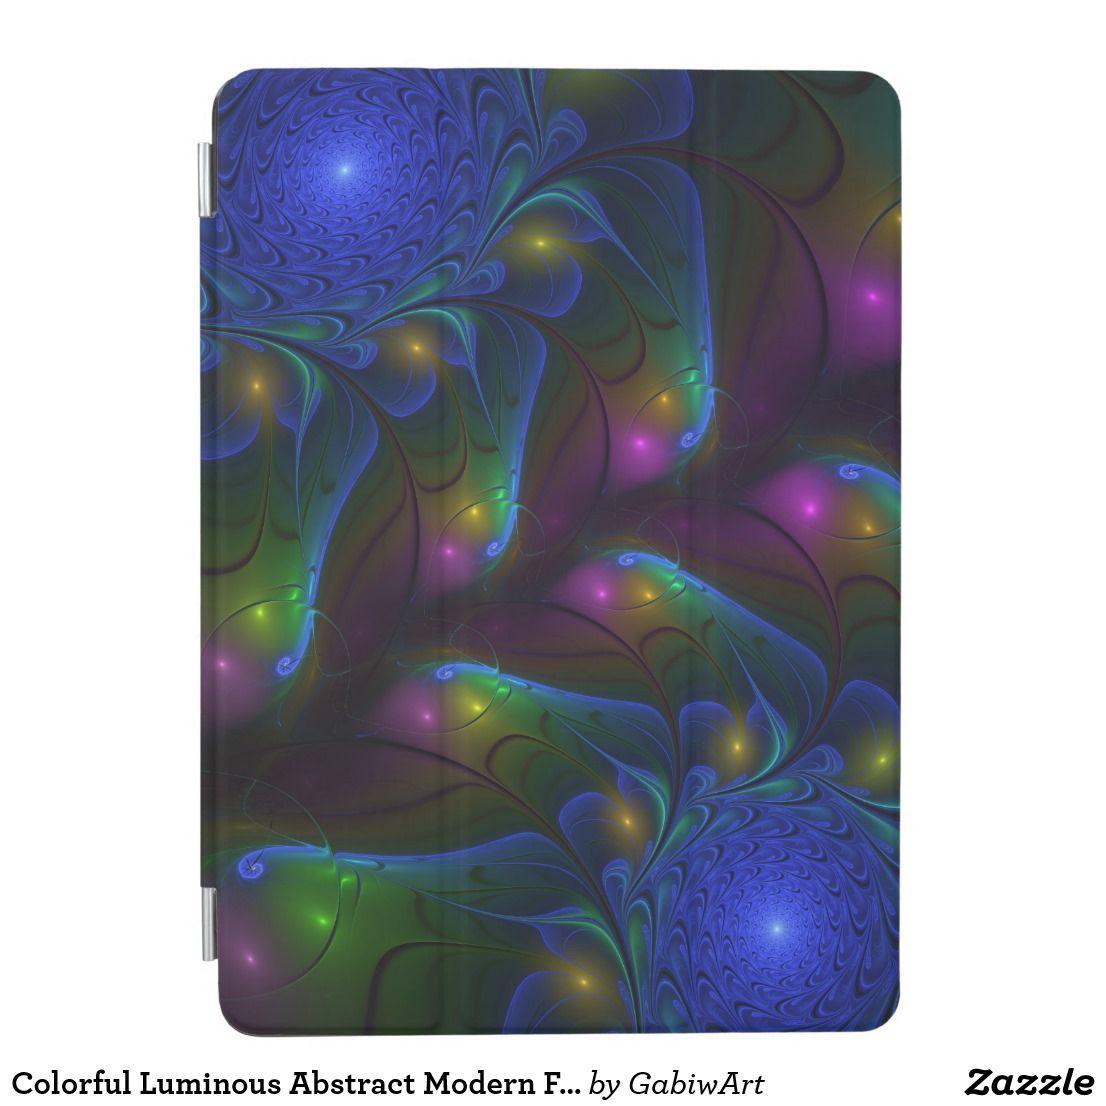 Colorful luminous abstract modern fractal art ipad air